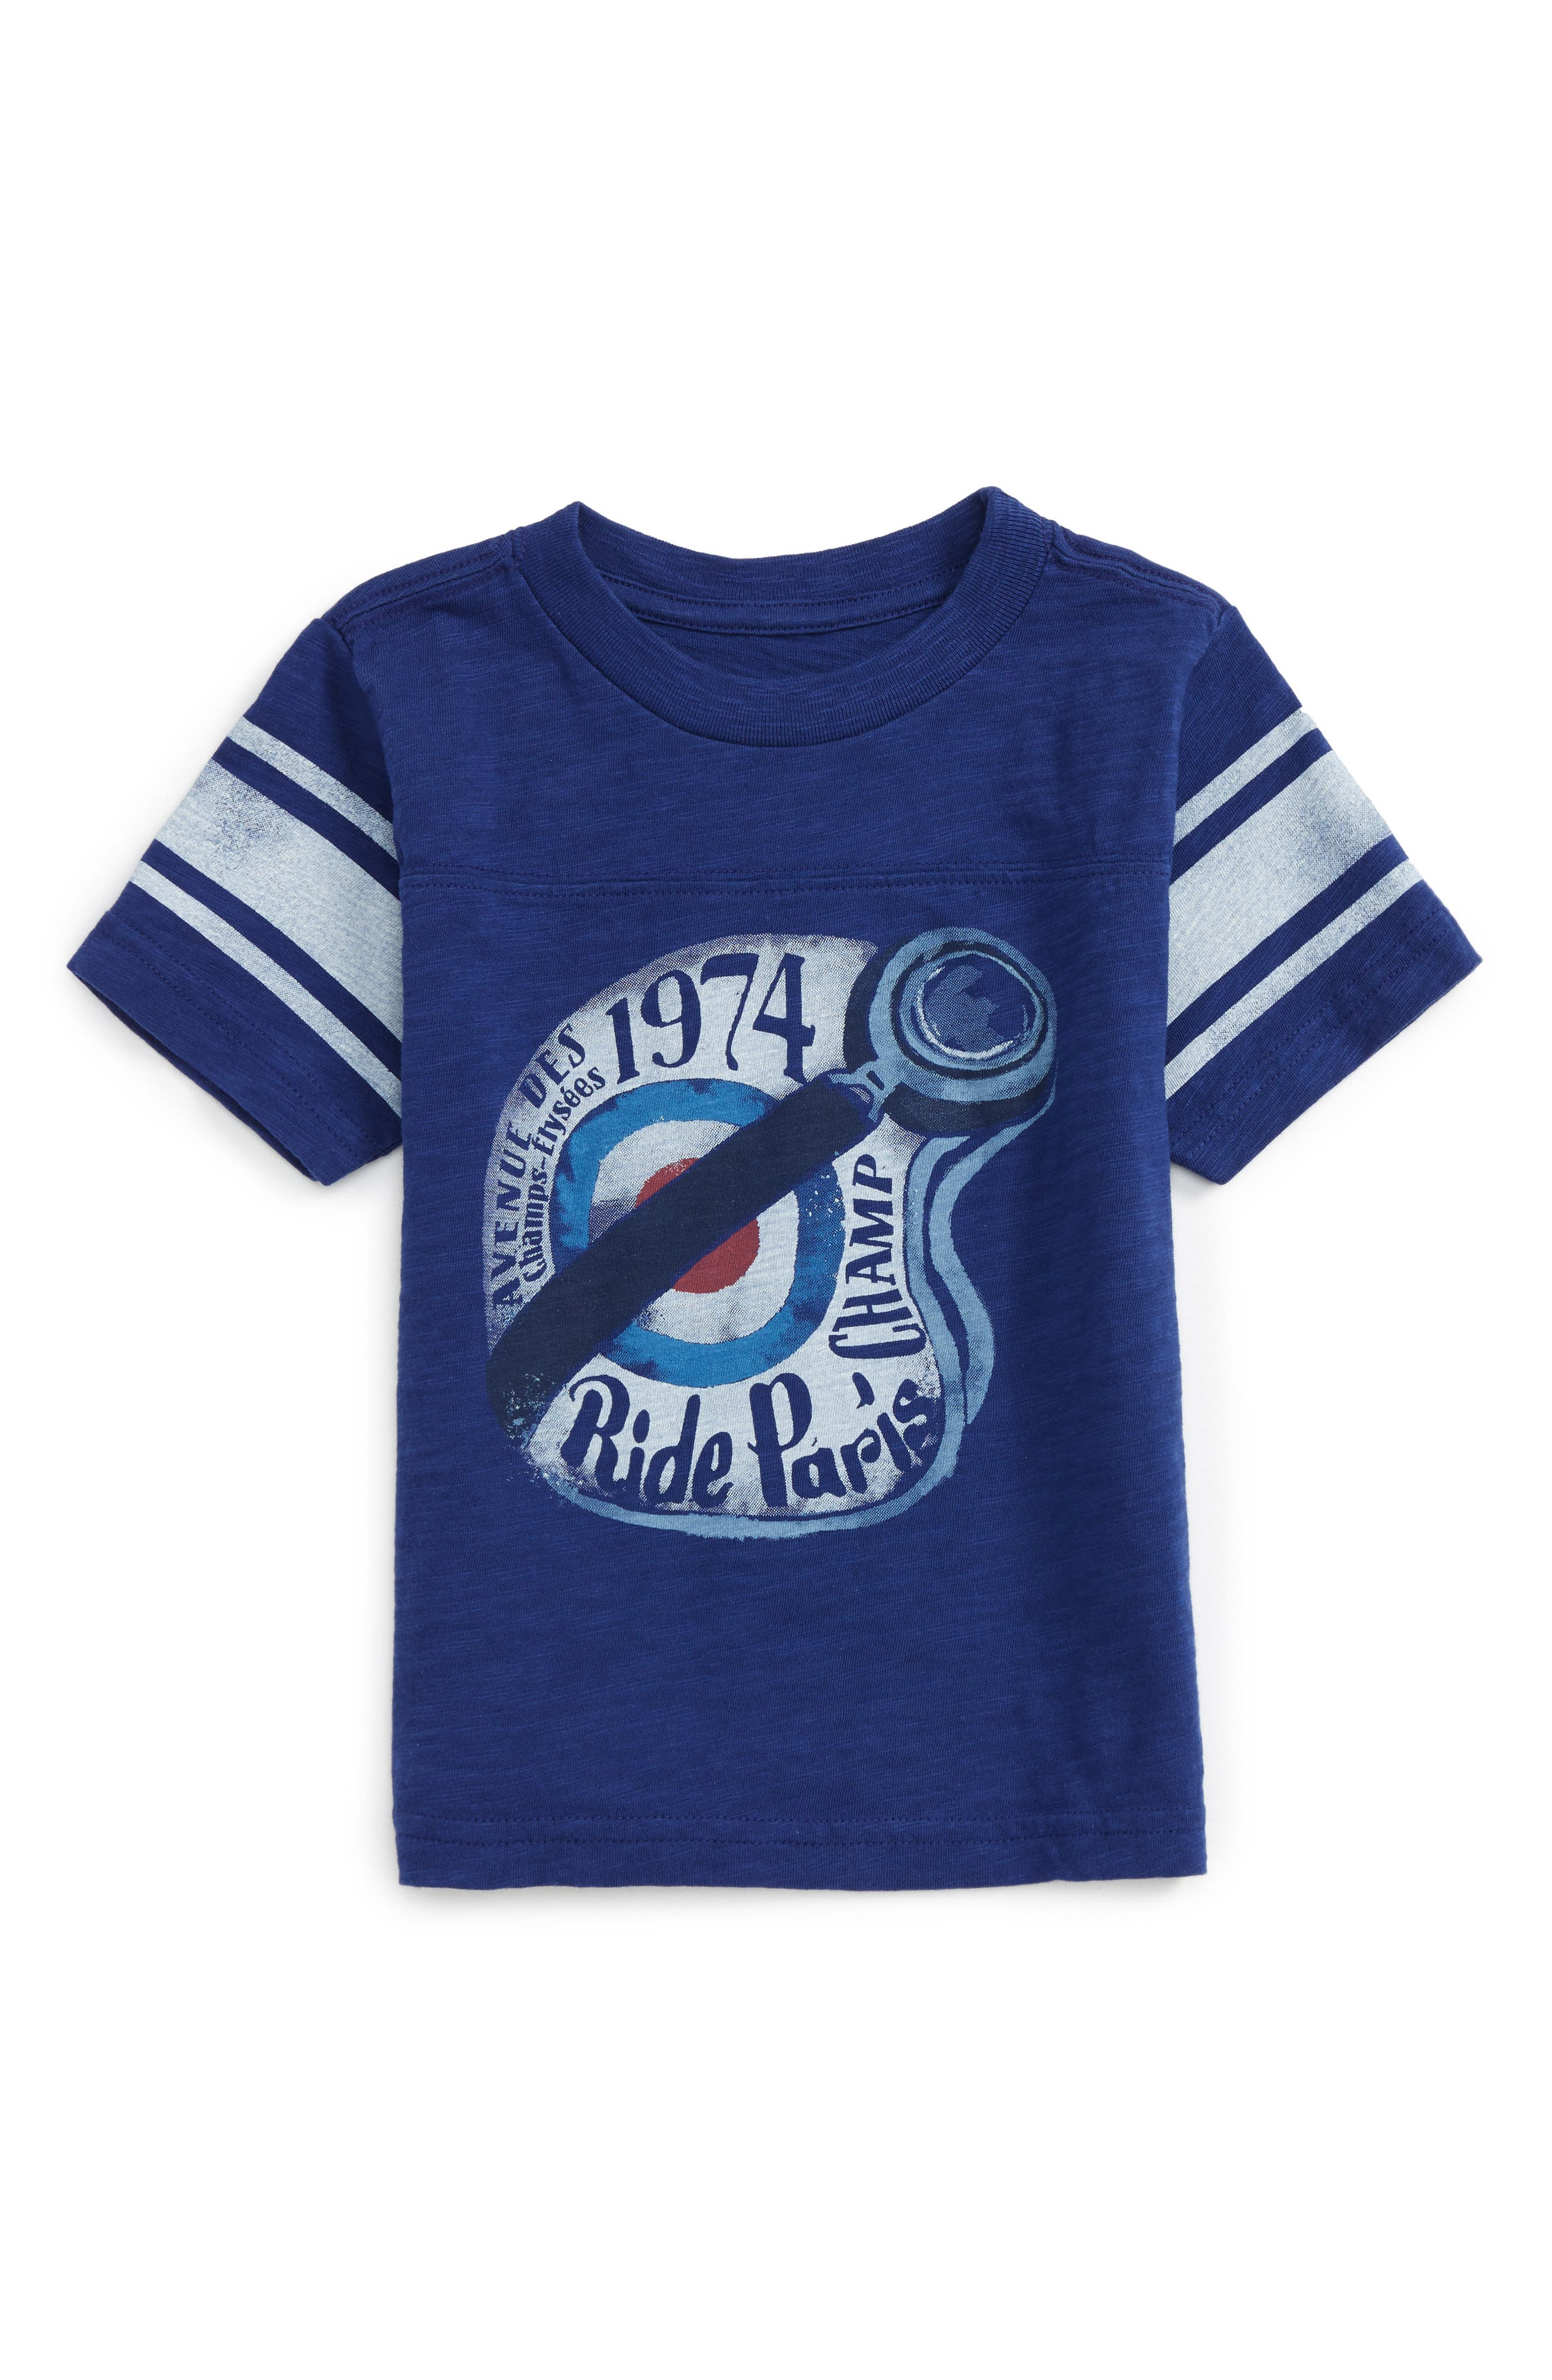 Main Image - Peek Helmet Graphic T-Shirt (Toddler Boys, Little Boys & Big Boys)